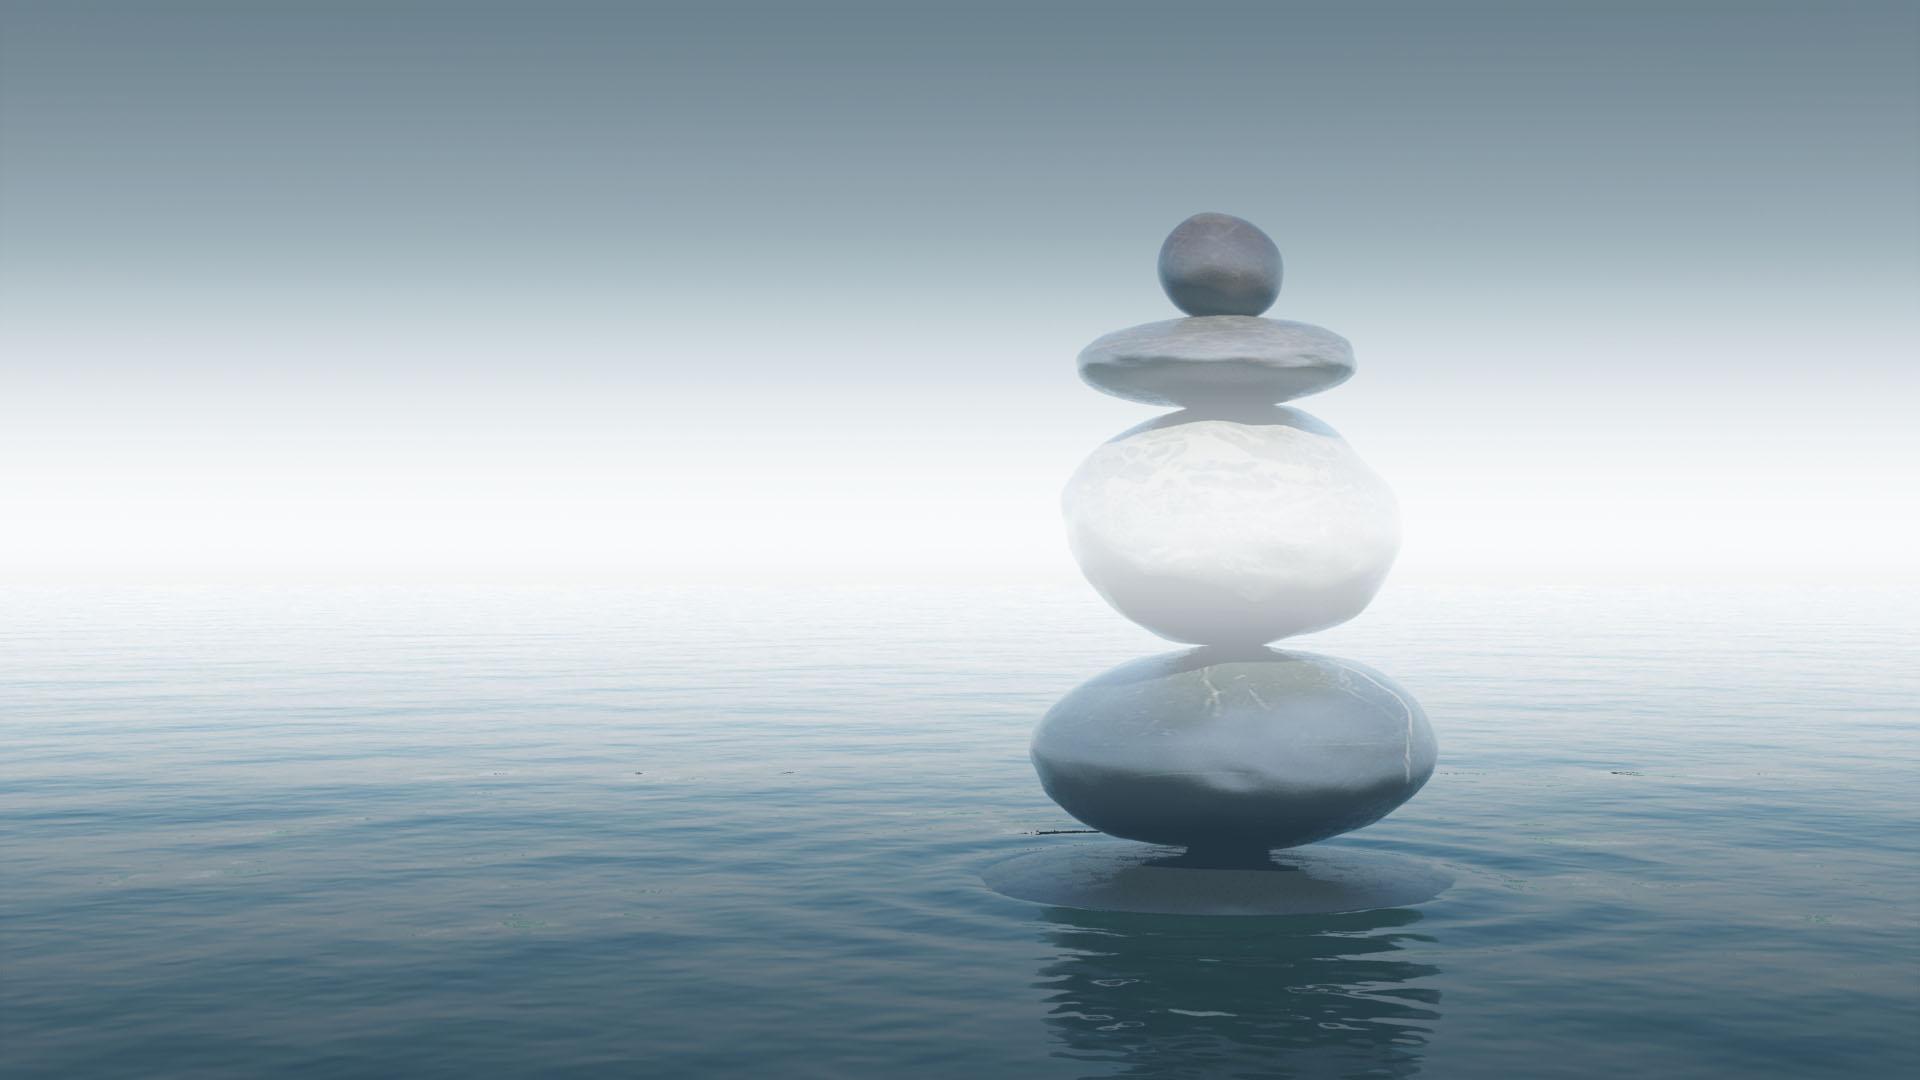 Design in Balance